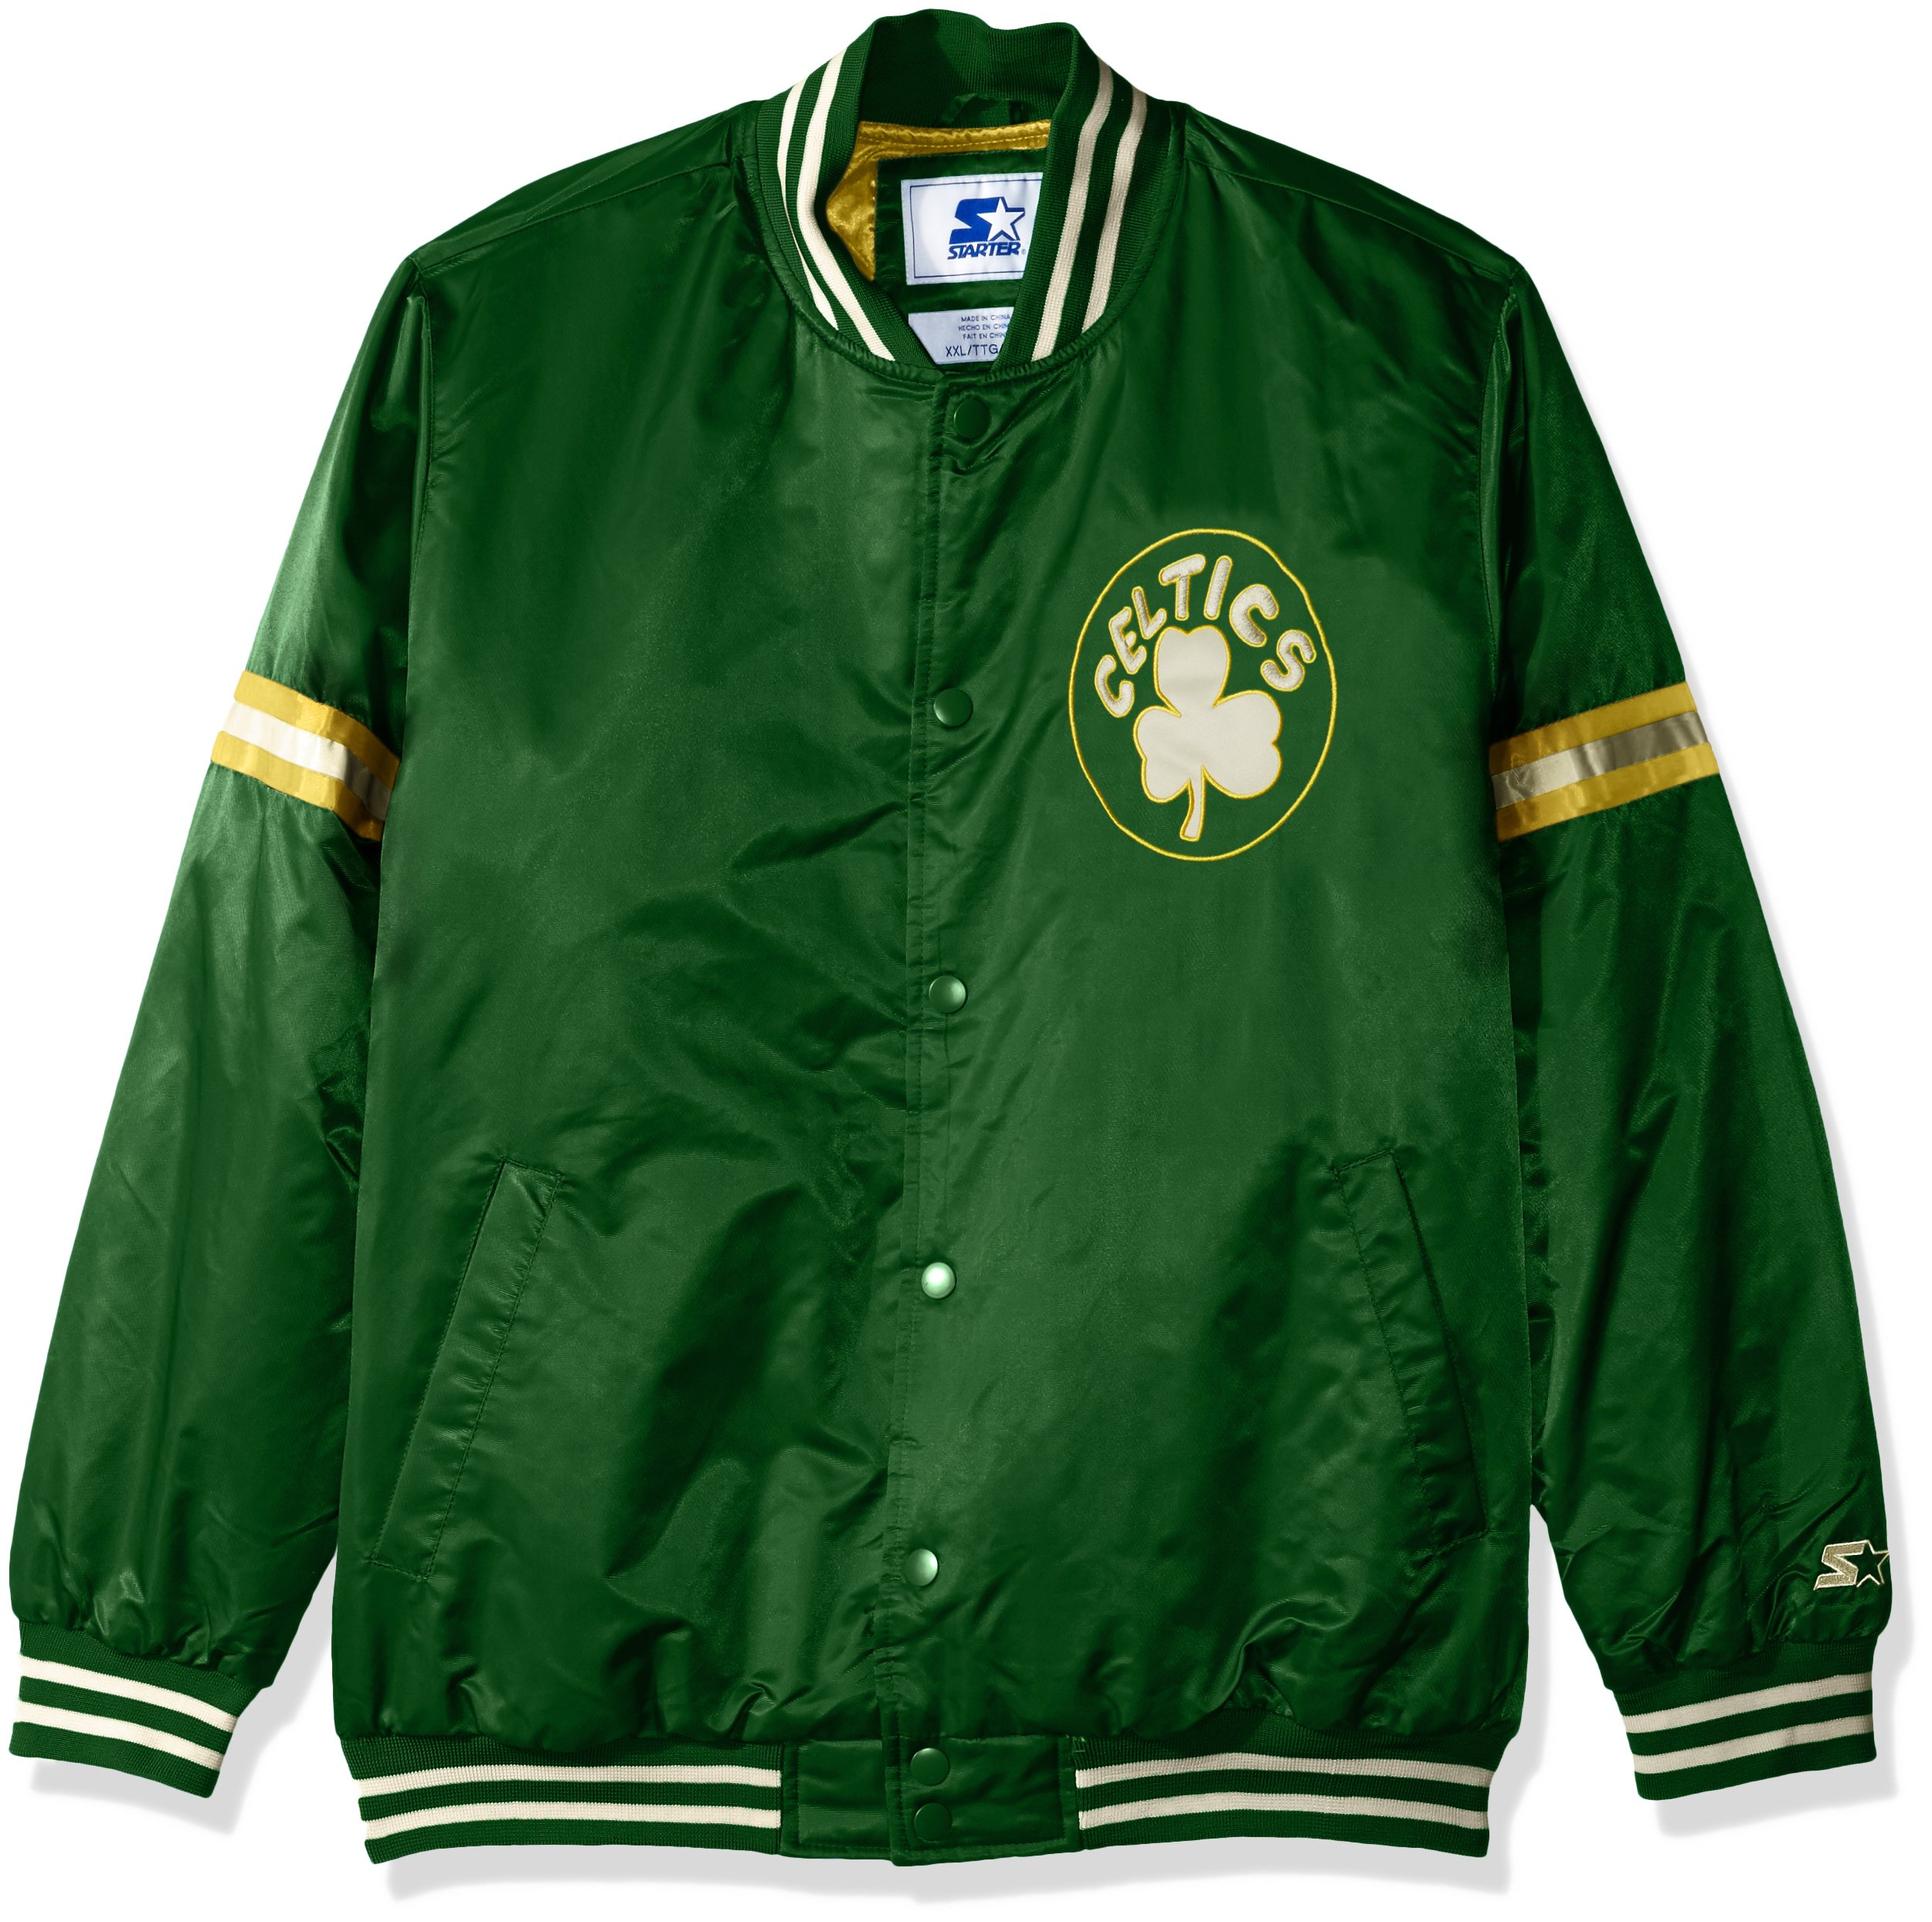 STARTER NBA Boston Celtics Men's Legecy Retro Satin Jacket, 3X, Green